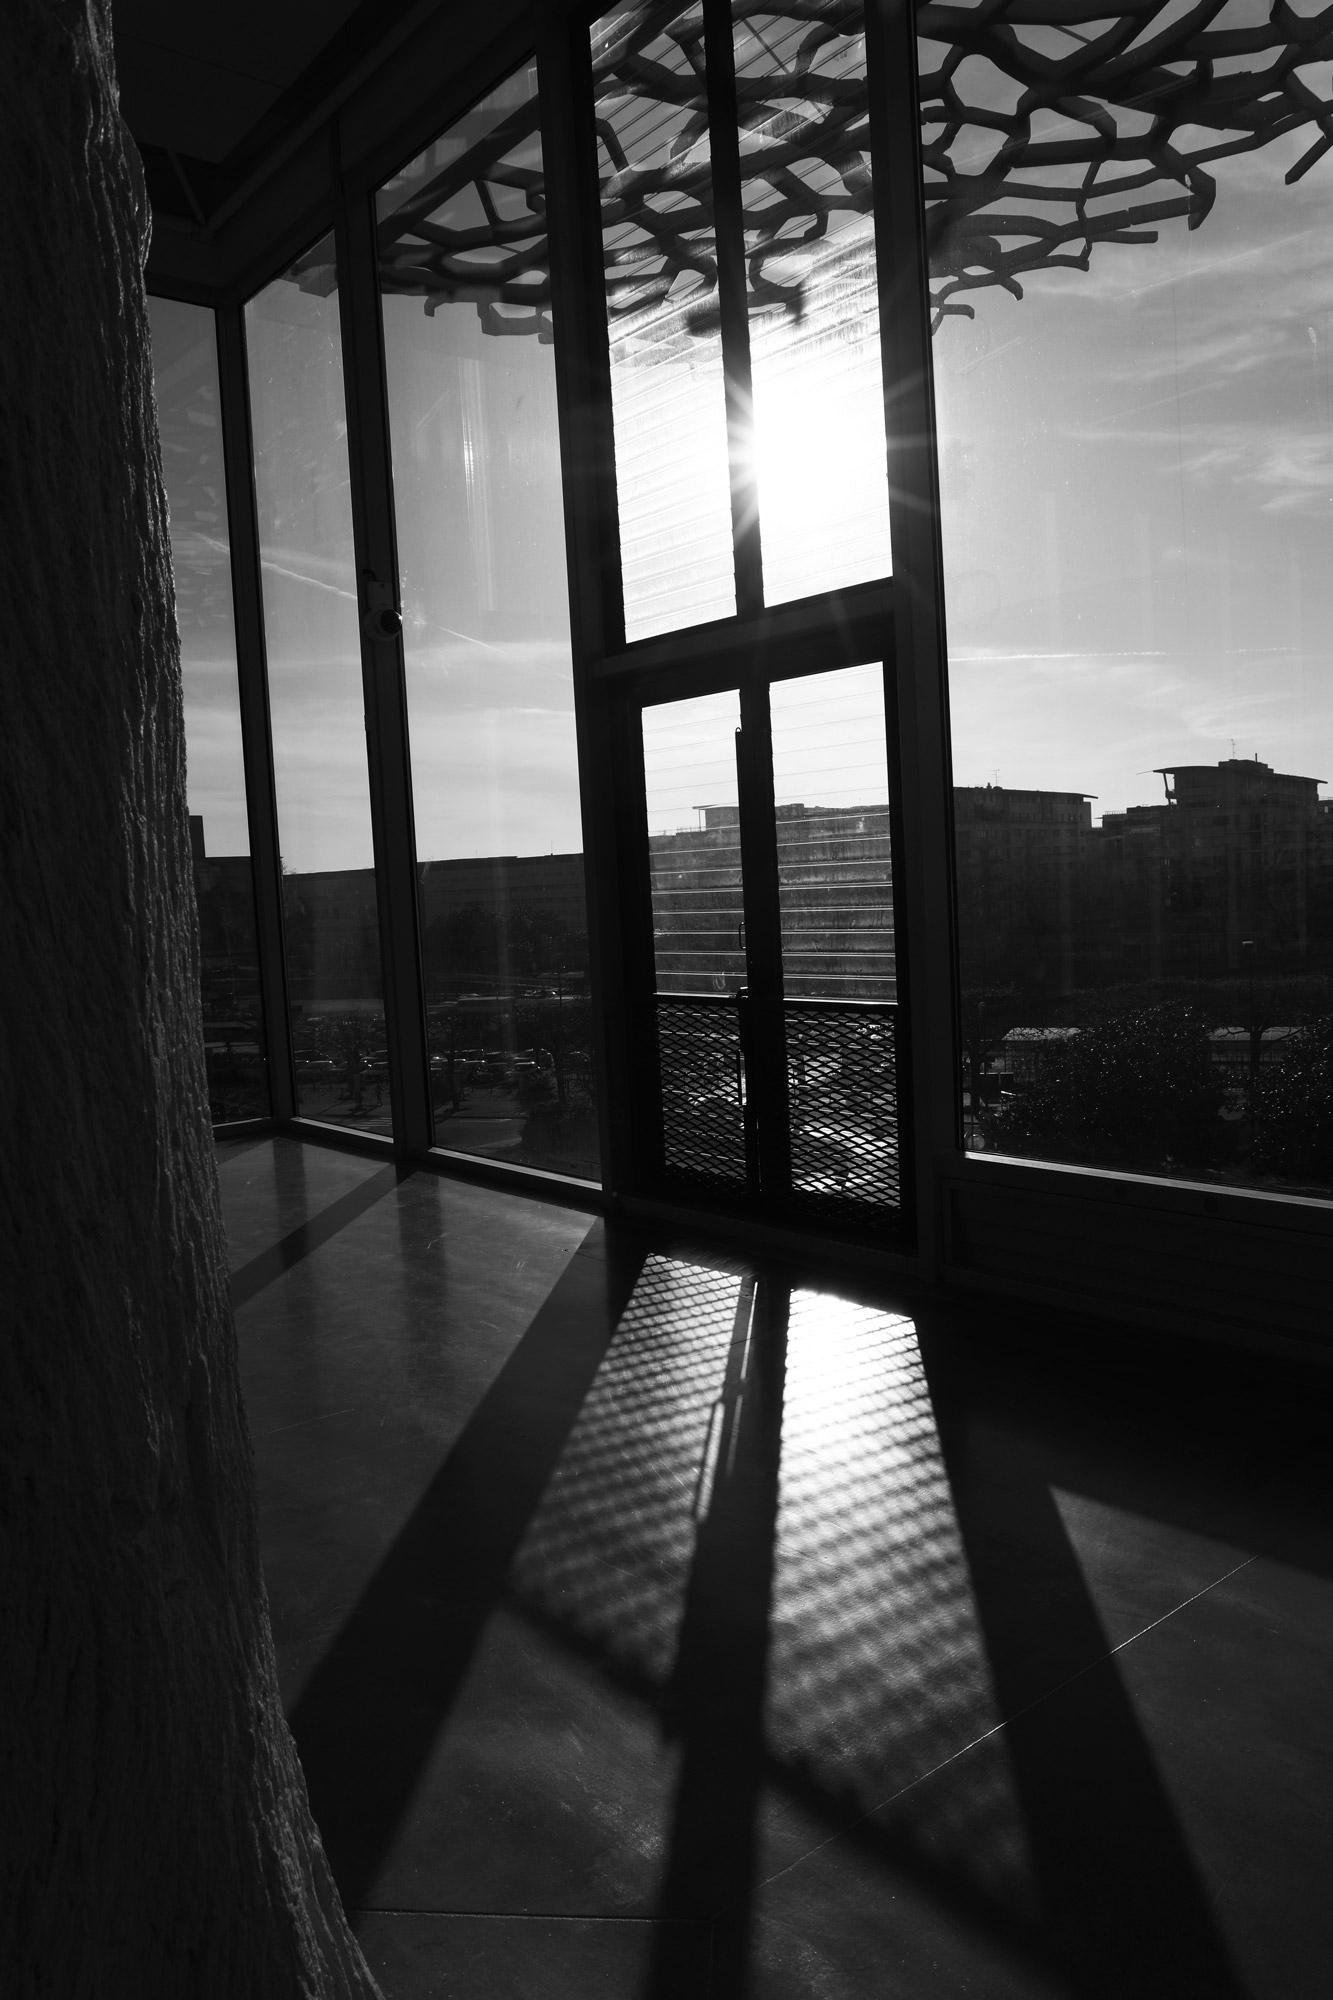 """Sun door"" - Gare de Nantes. ©Clémence Rougetet"